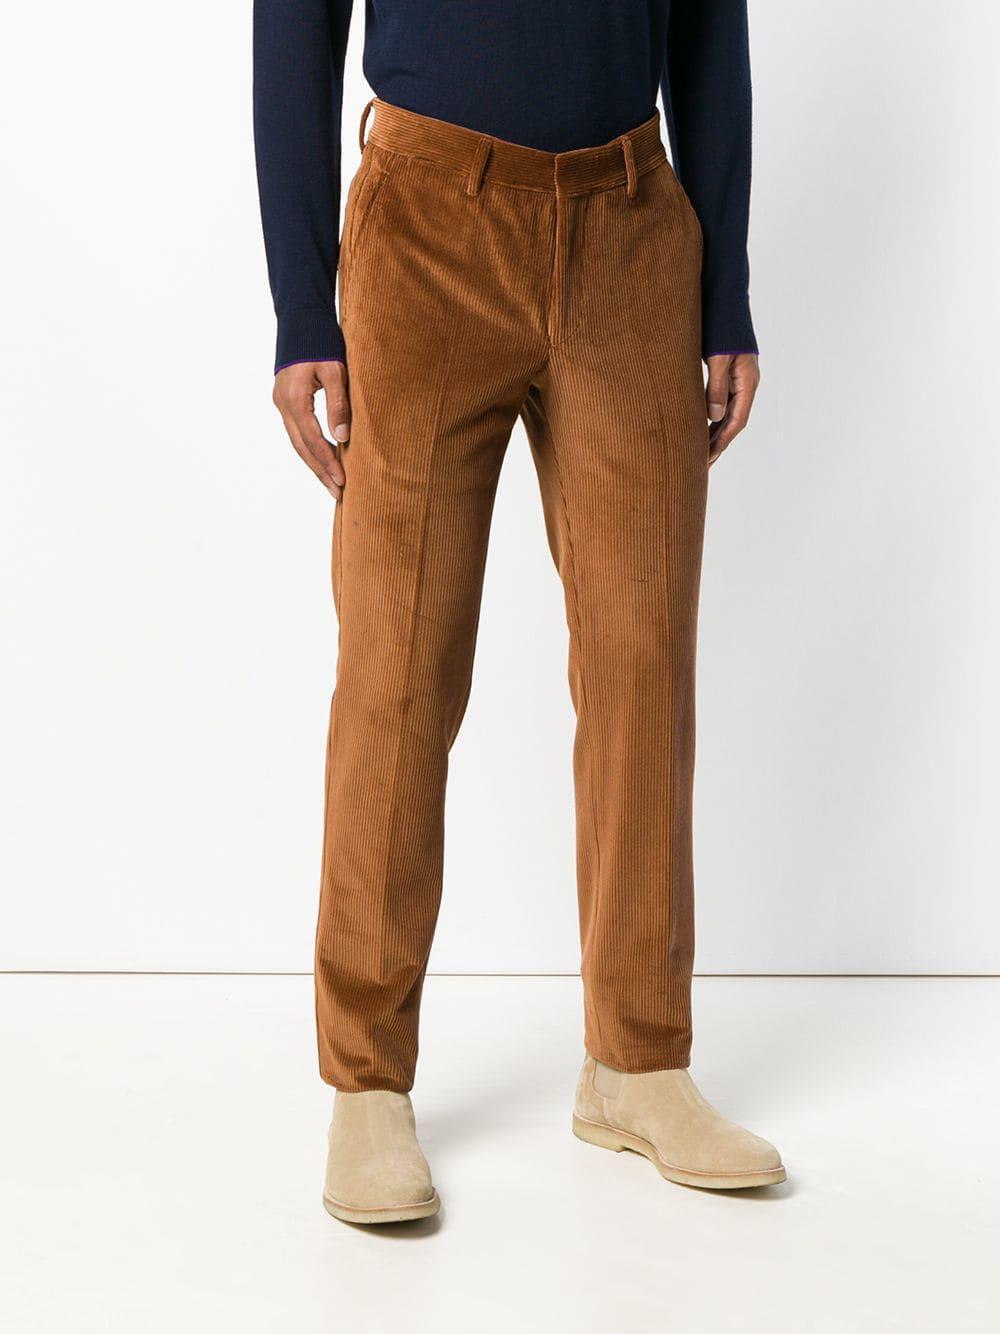 The Gigi Corduroy Trousers in Yellow & Orange (Brown) for Men